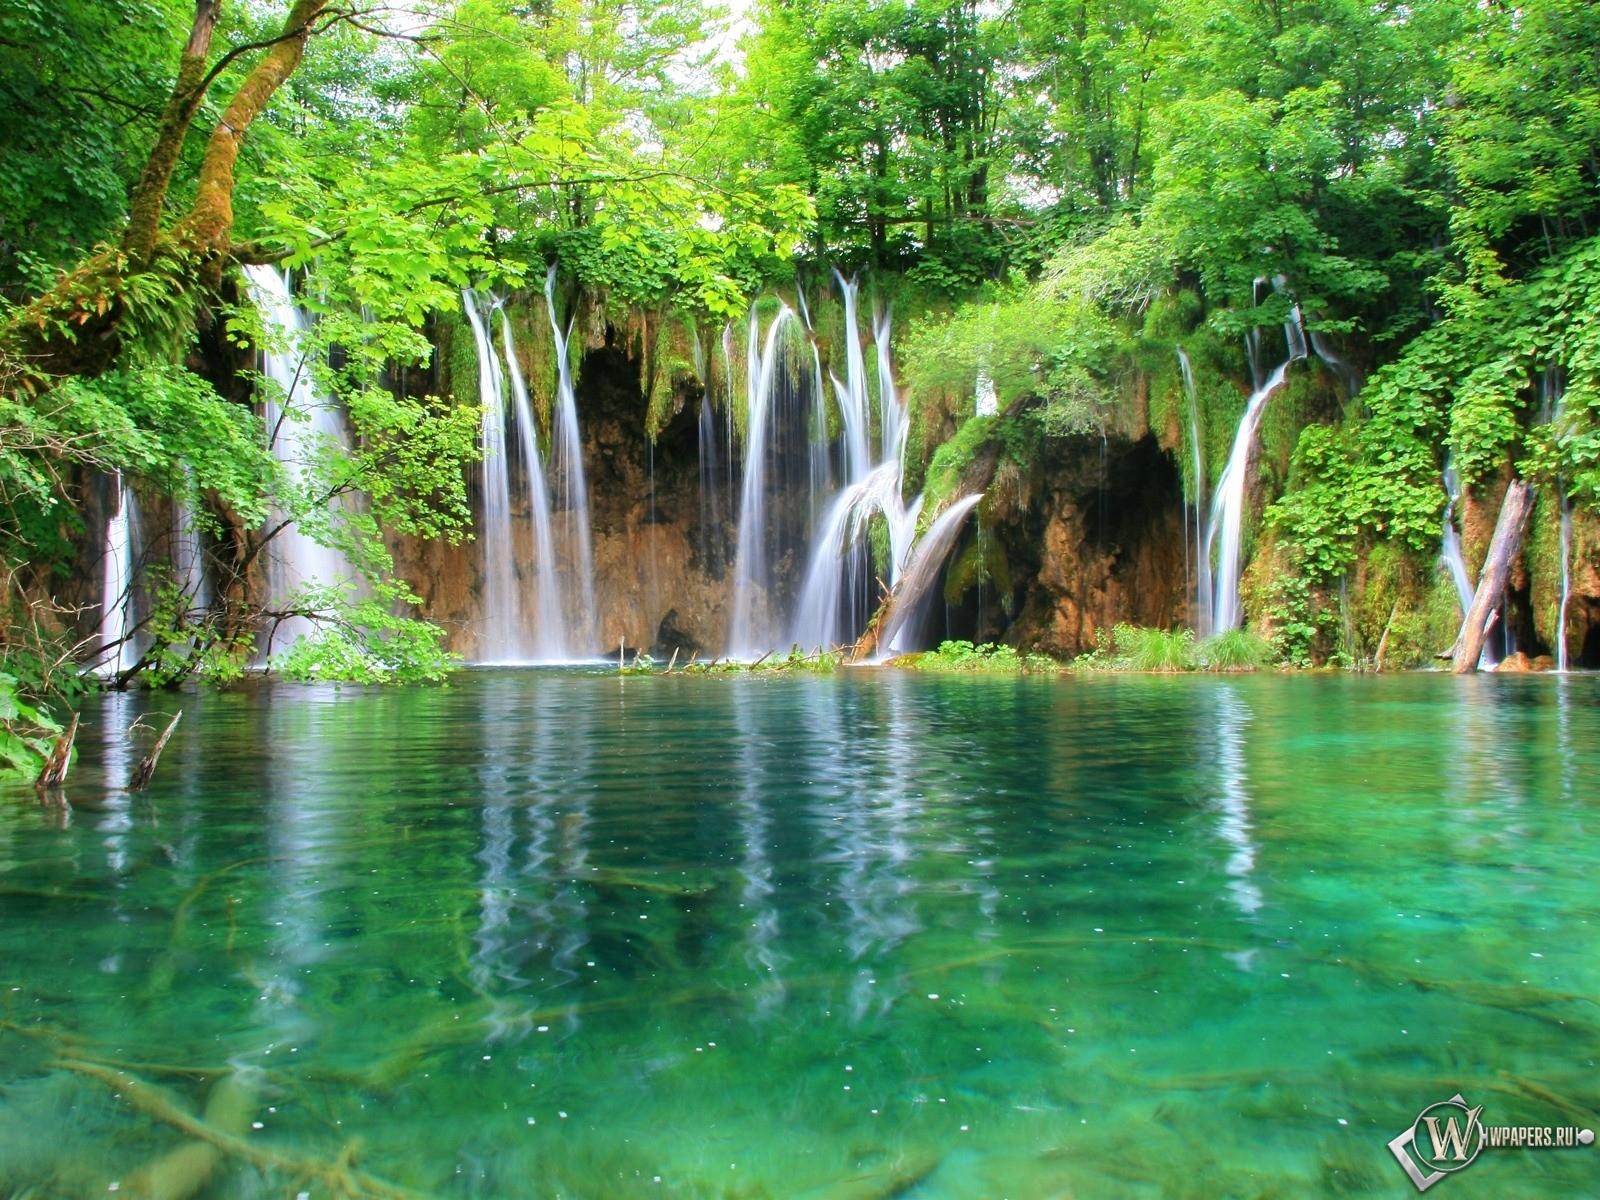 Водопад в лесу 1600x1200